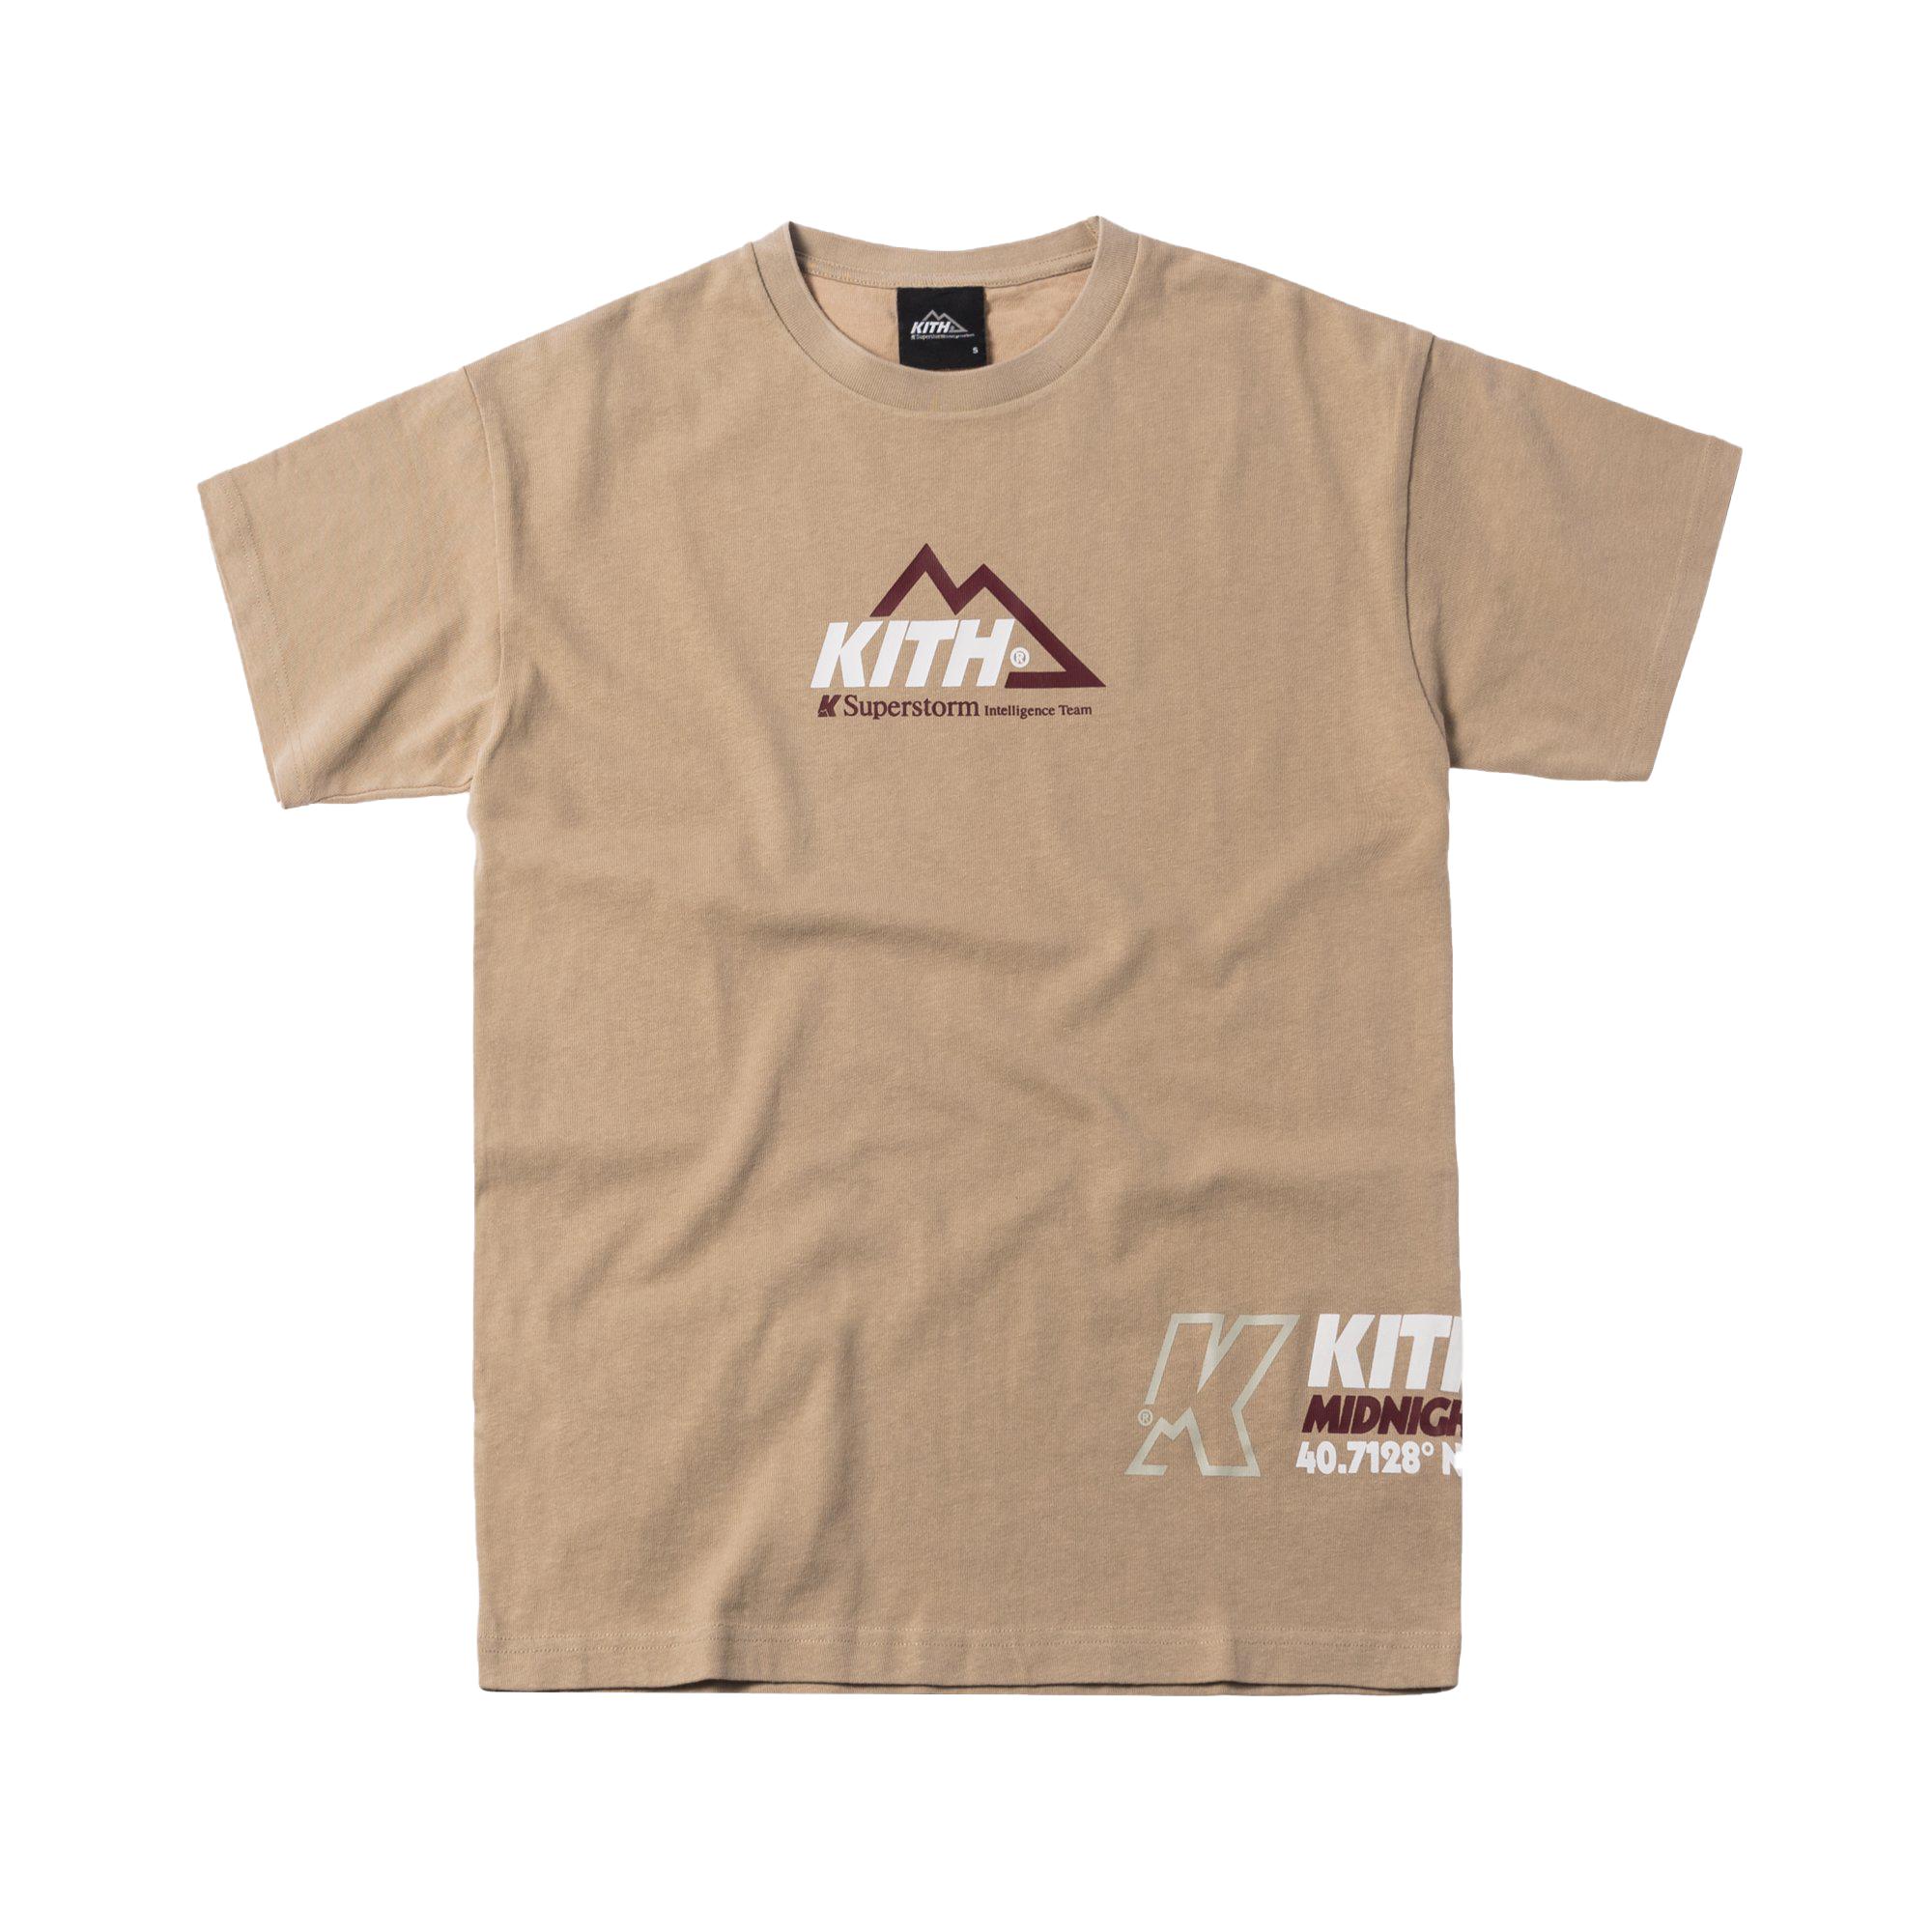 Kith Team Tee Ancient Fossil